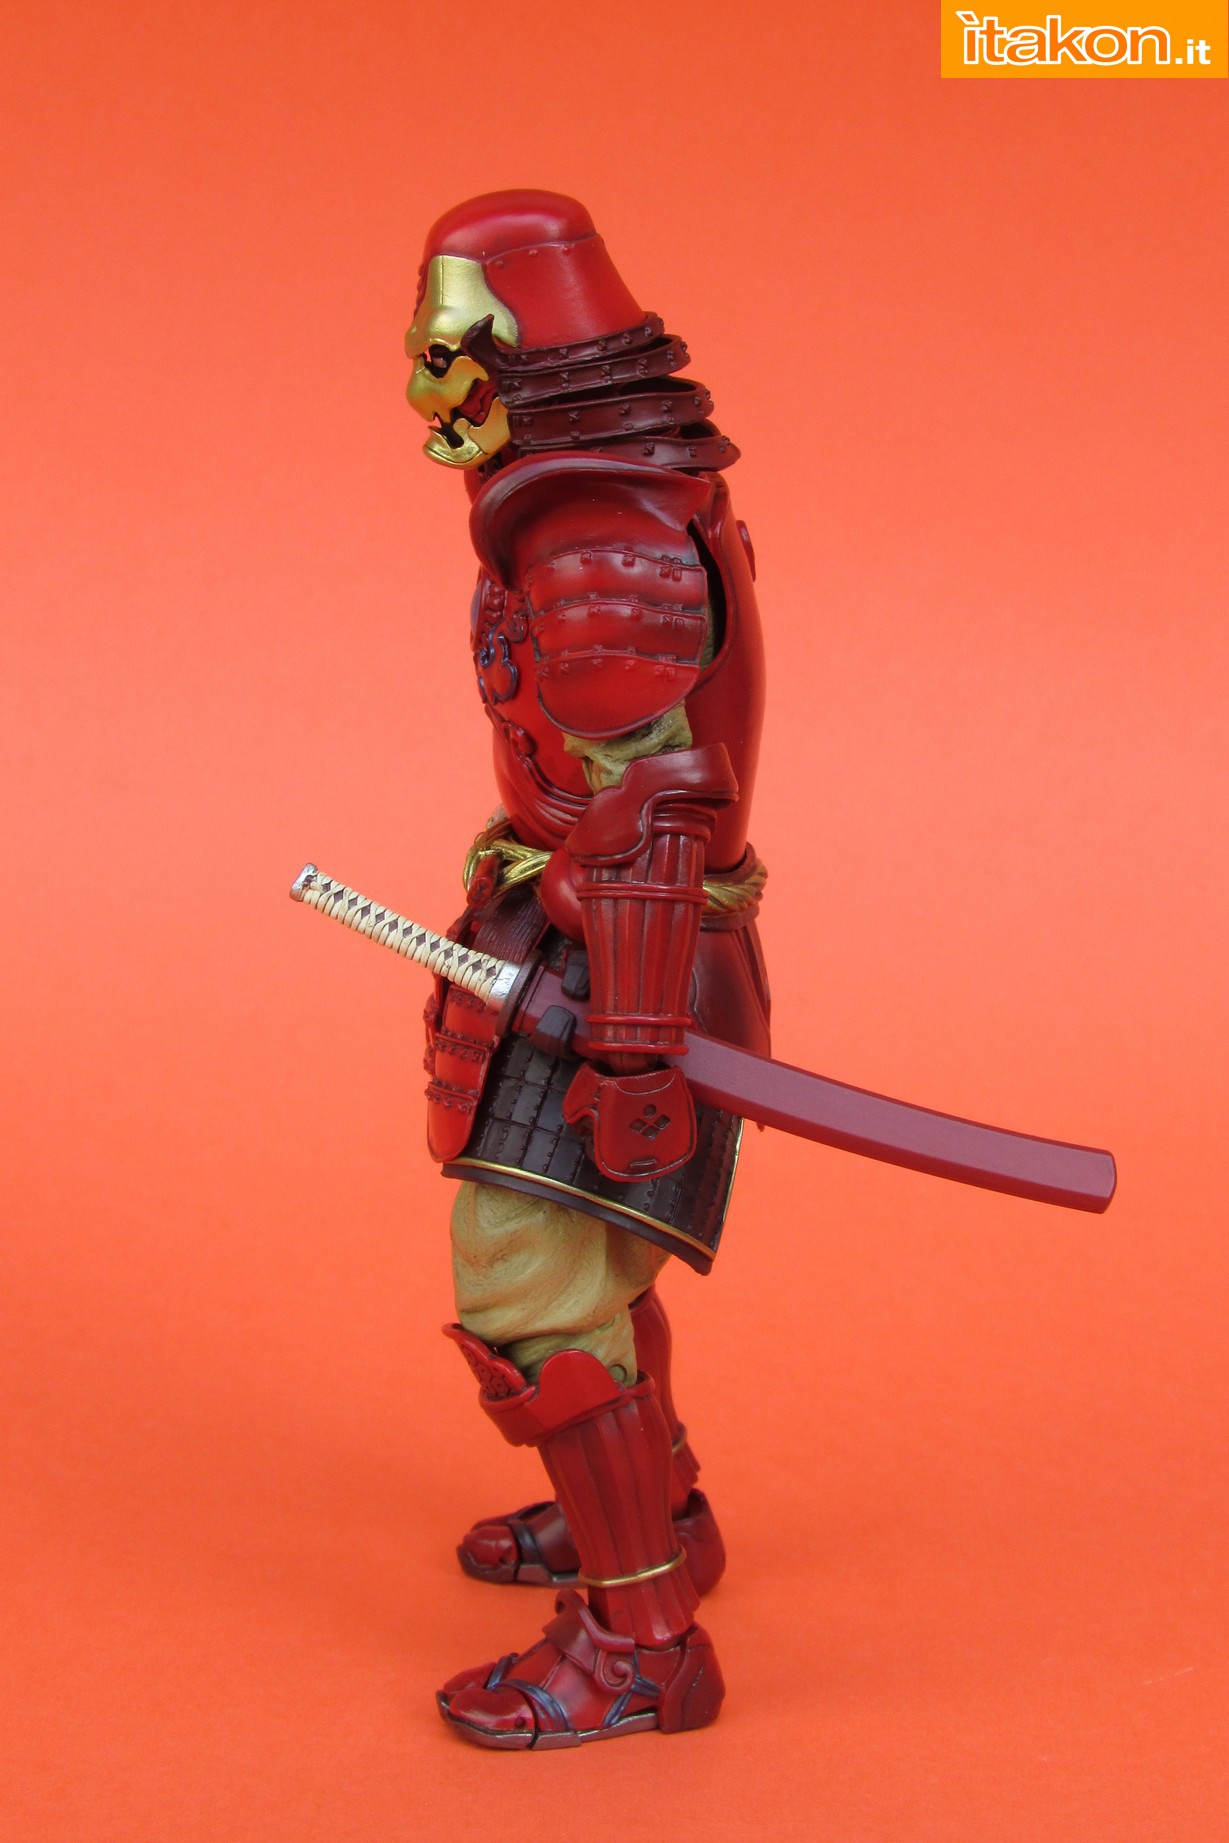 Link a Marvel Comics Koutetsu Samurai Iron Man Mark 3 Meishou MANGA REALIZATION review Bandai Itakon.it12